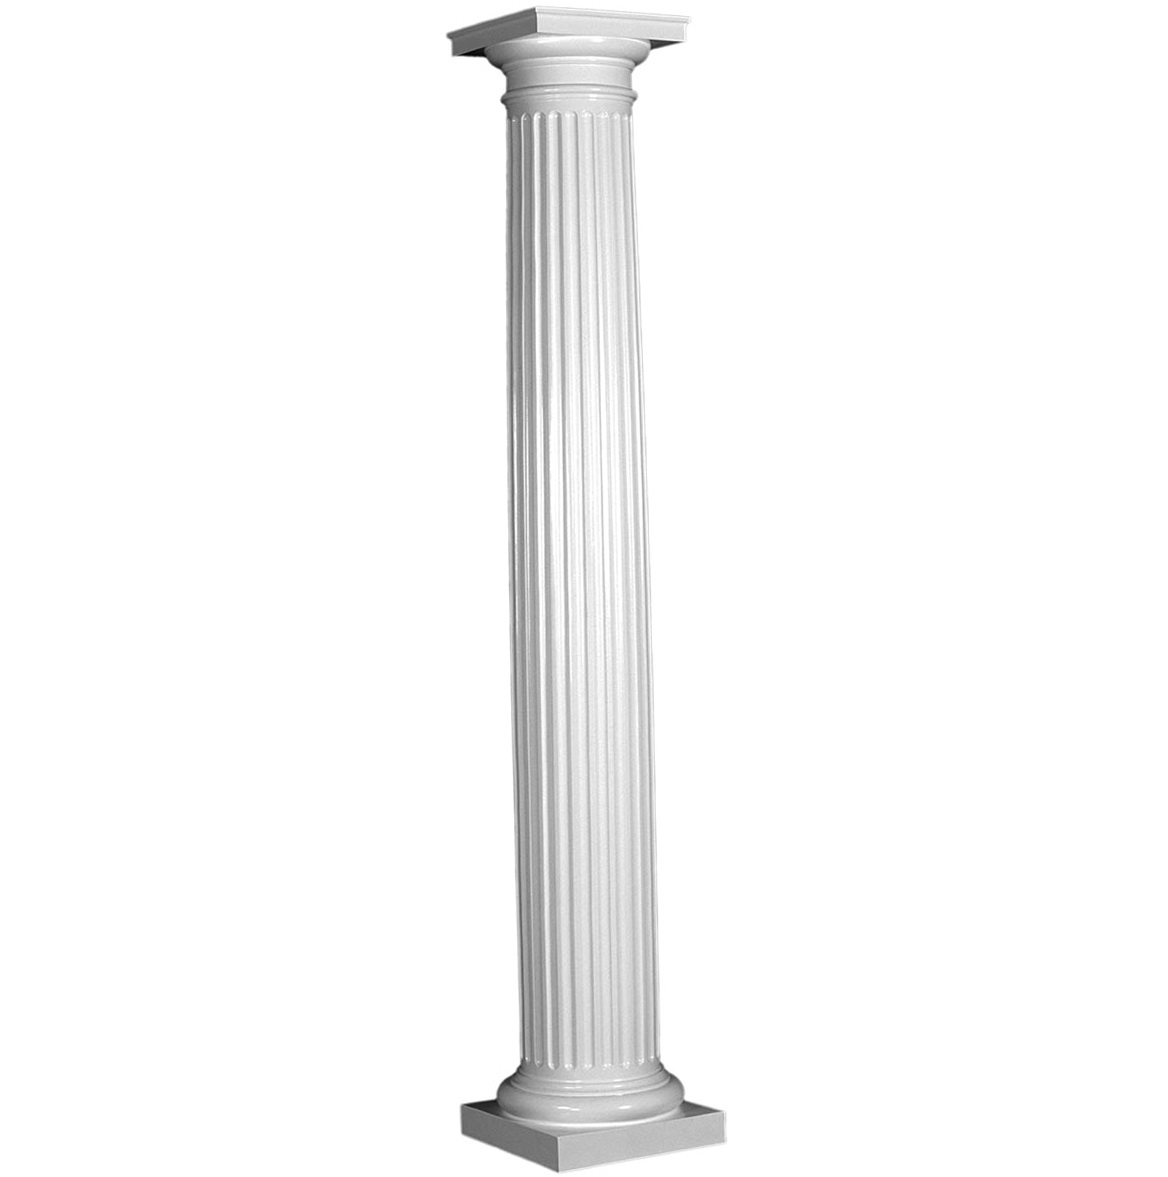 Decorative Columns Home Depot: Decorative Porch Columns Home Depot